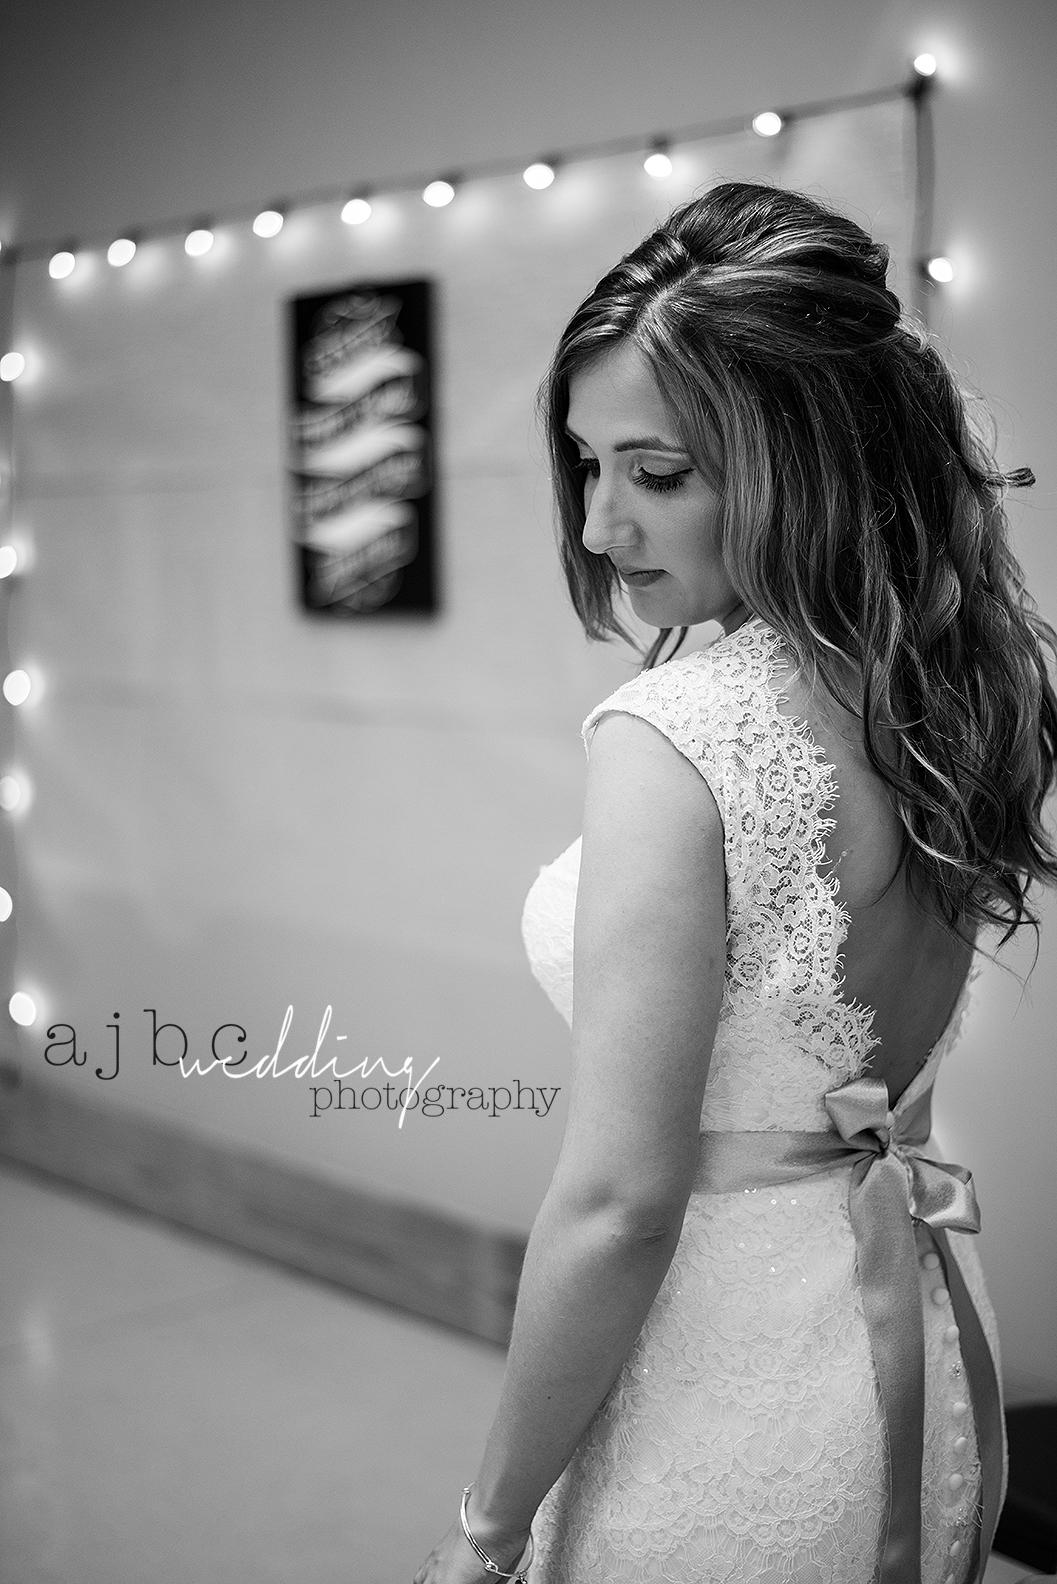 ajbcphotography-port-huron-michigan-wedding-photographer-outdoors-summer-wedding-country-wedding-wadhams-michigan-bride-vintage-wedding3.jpg